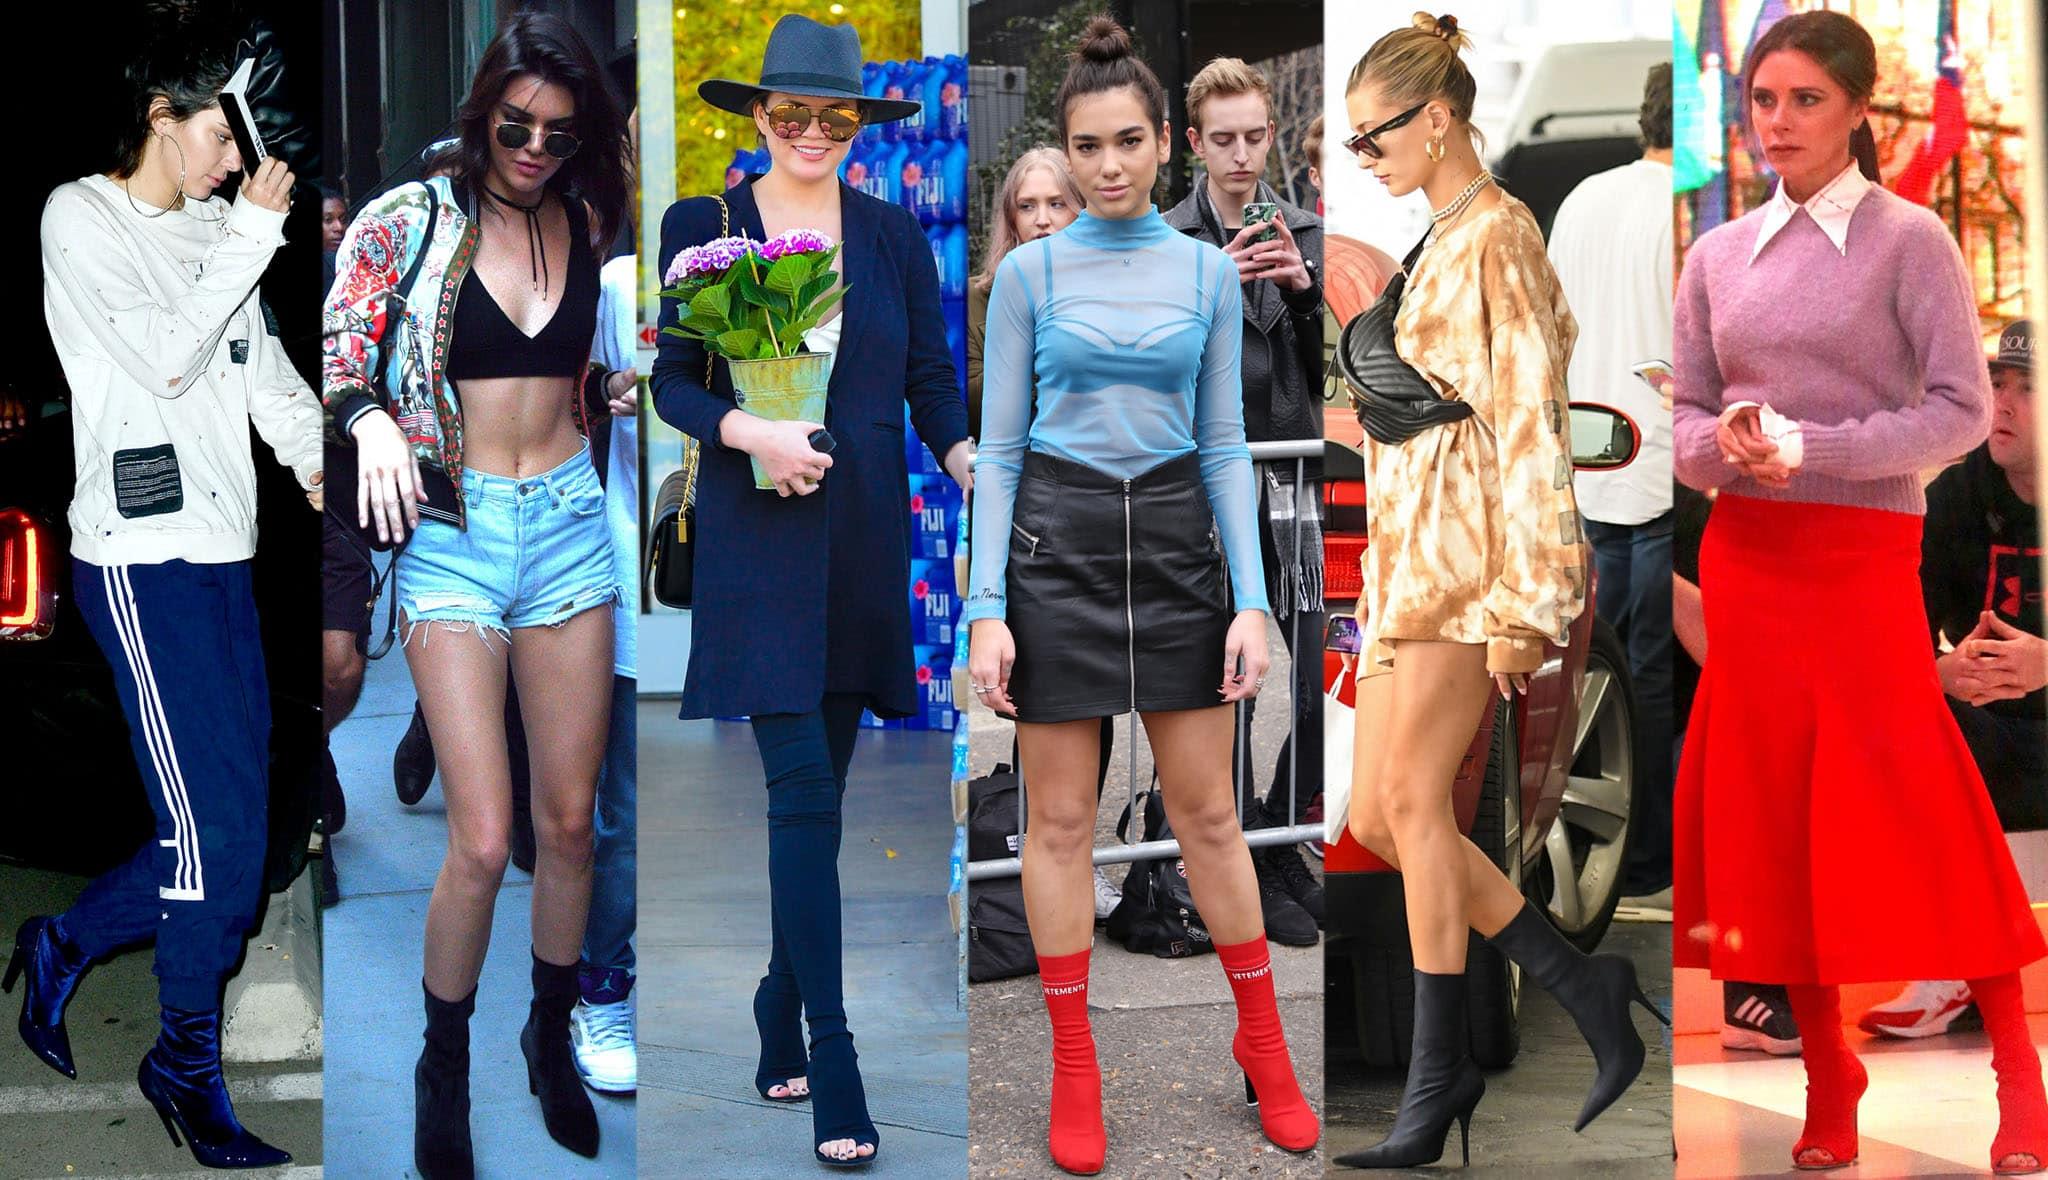 Kendall Jenner, Chrissy Teigen, Dua Lipa, Hailey Bieber, and Victoria Beckham wearing different styles of sock boots